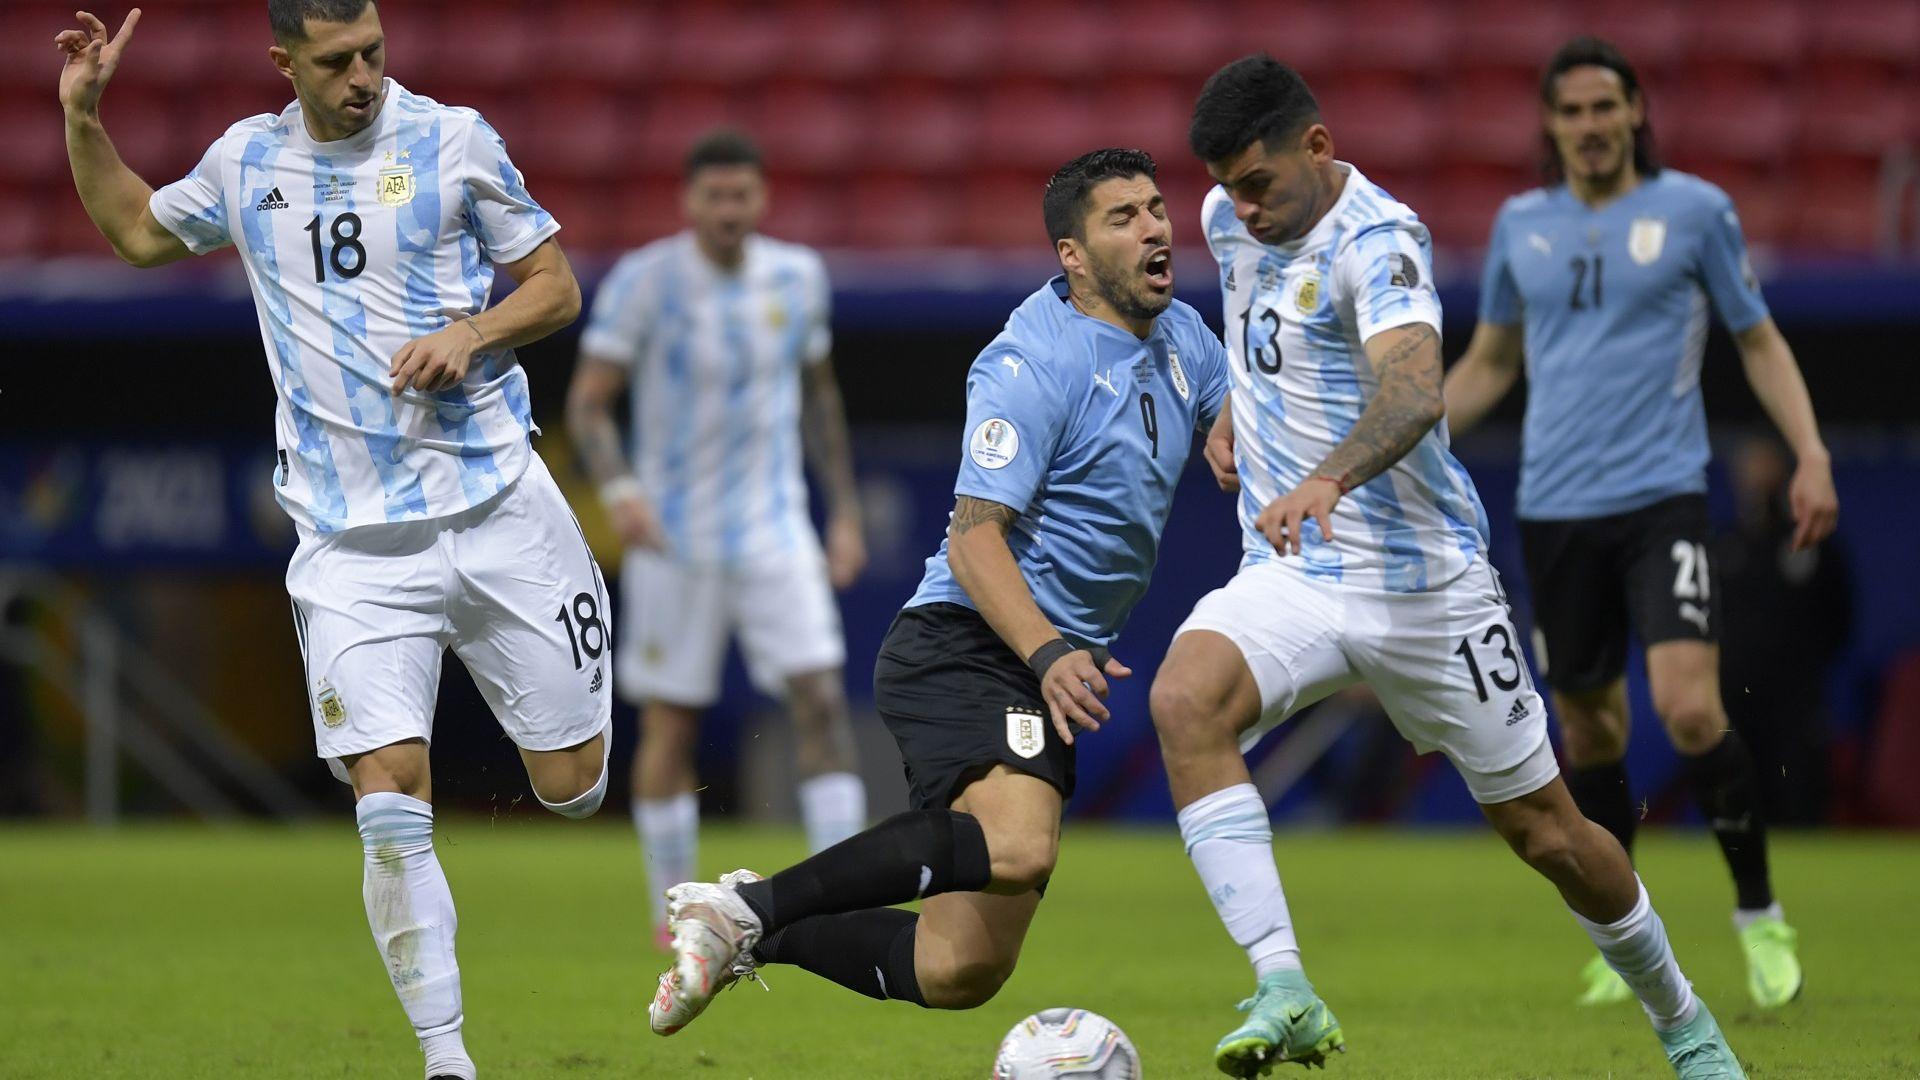 Дебютен гол донесе първа победа за Аржентина на Копа Америка